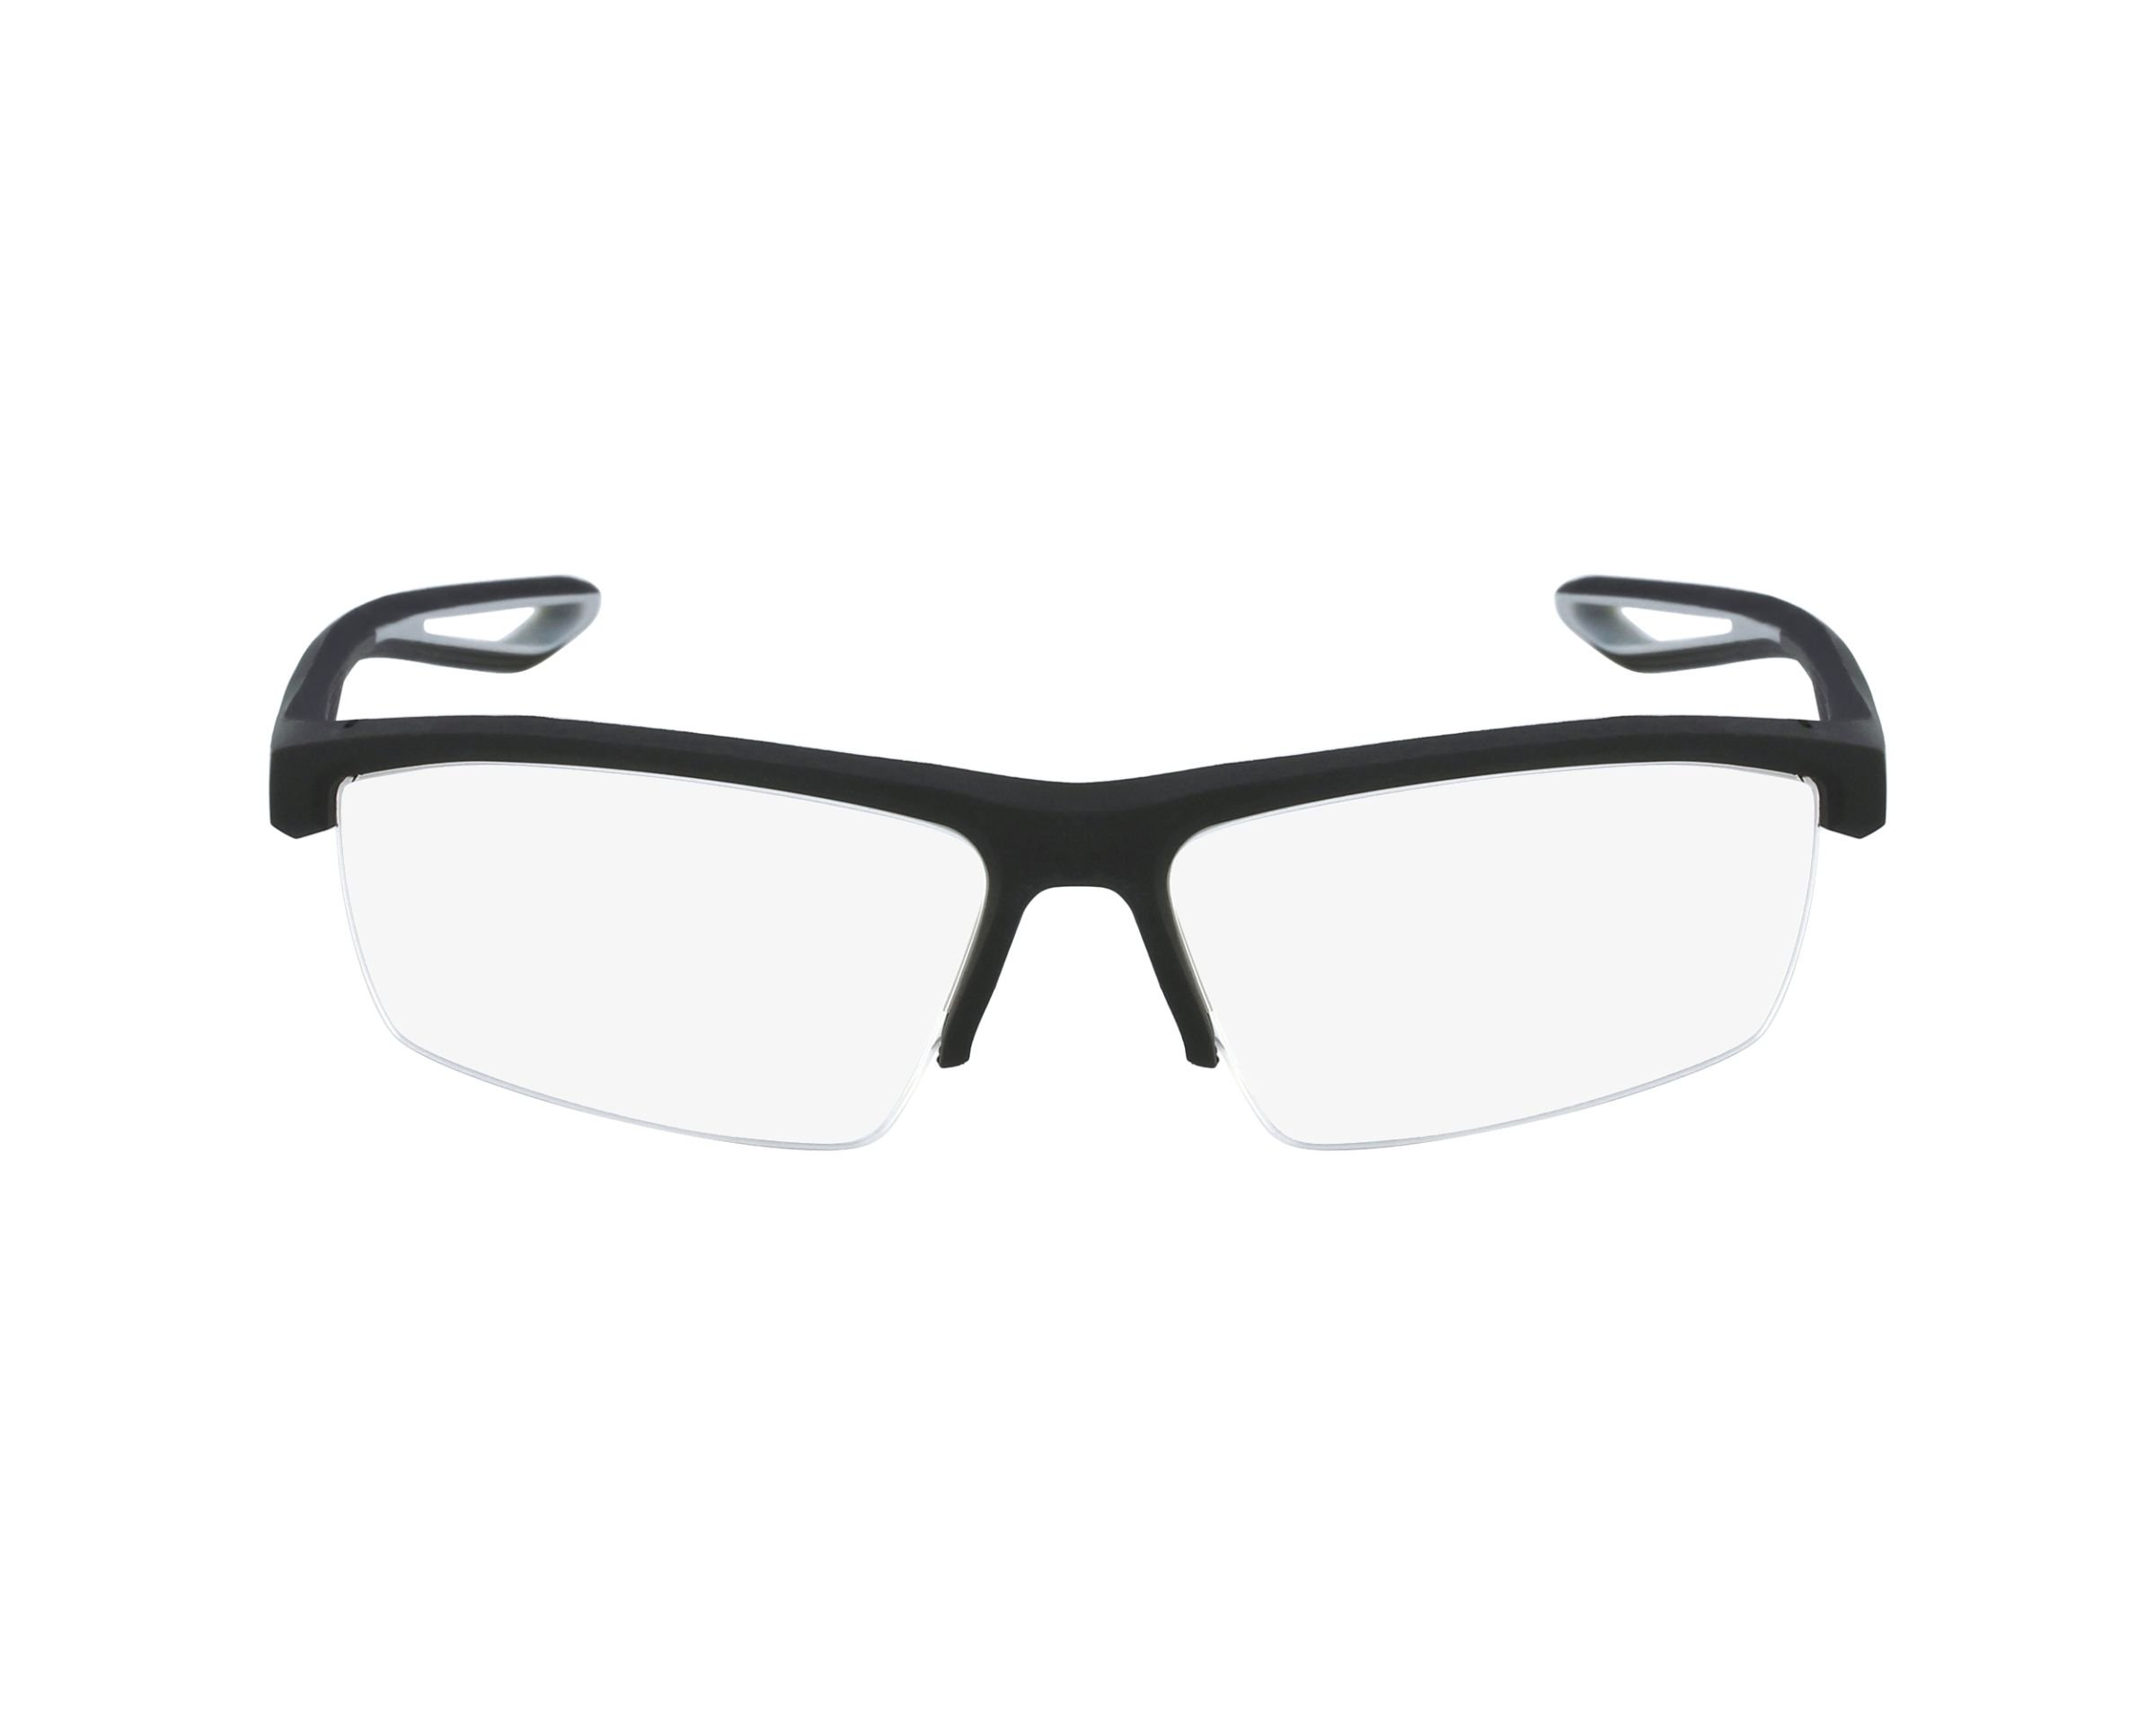 Eyeglasses NIKE 7079 001 BLACK